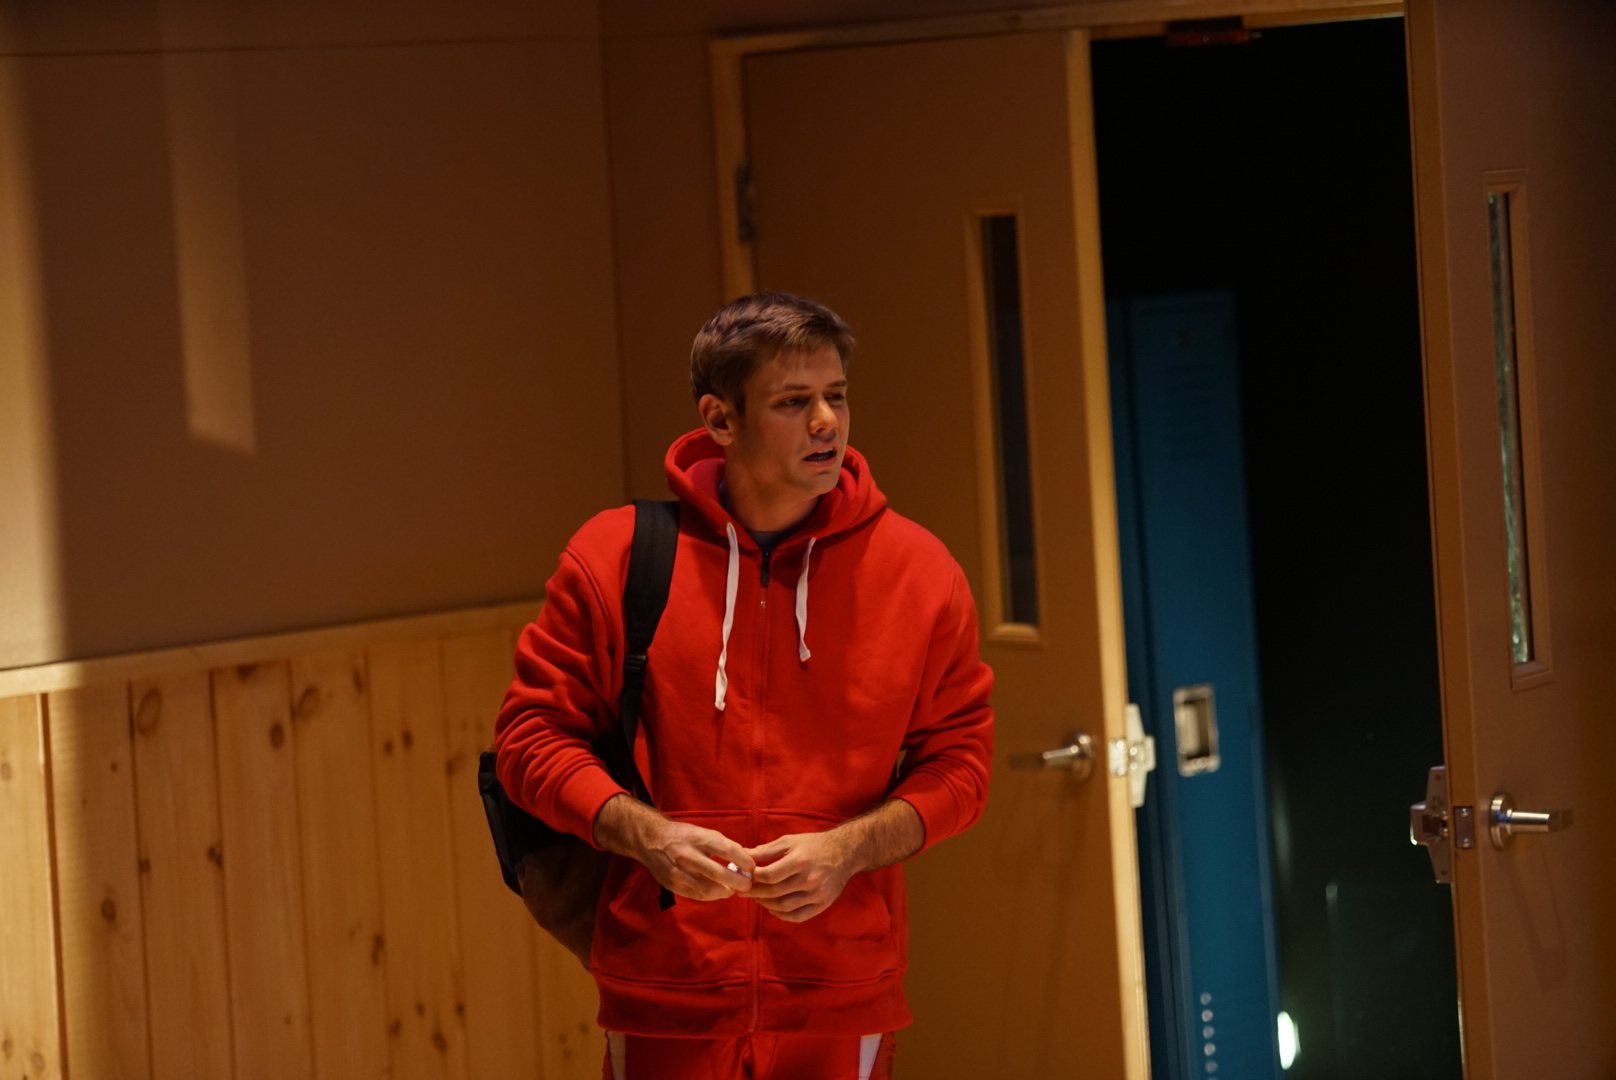 """The Rape of The Sabine Women by Grace B. Matthias"" / Playwrights Realm / Directed by Tyne Rafaeli / Photo by Daniel Vasquez"